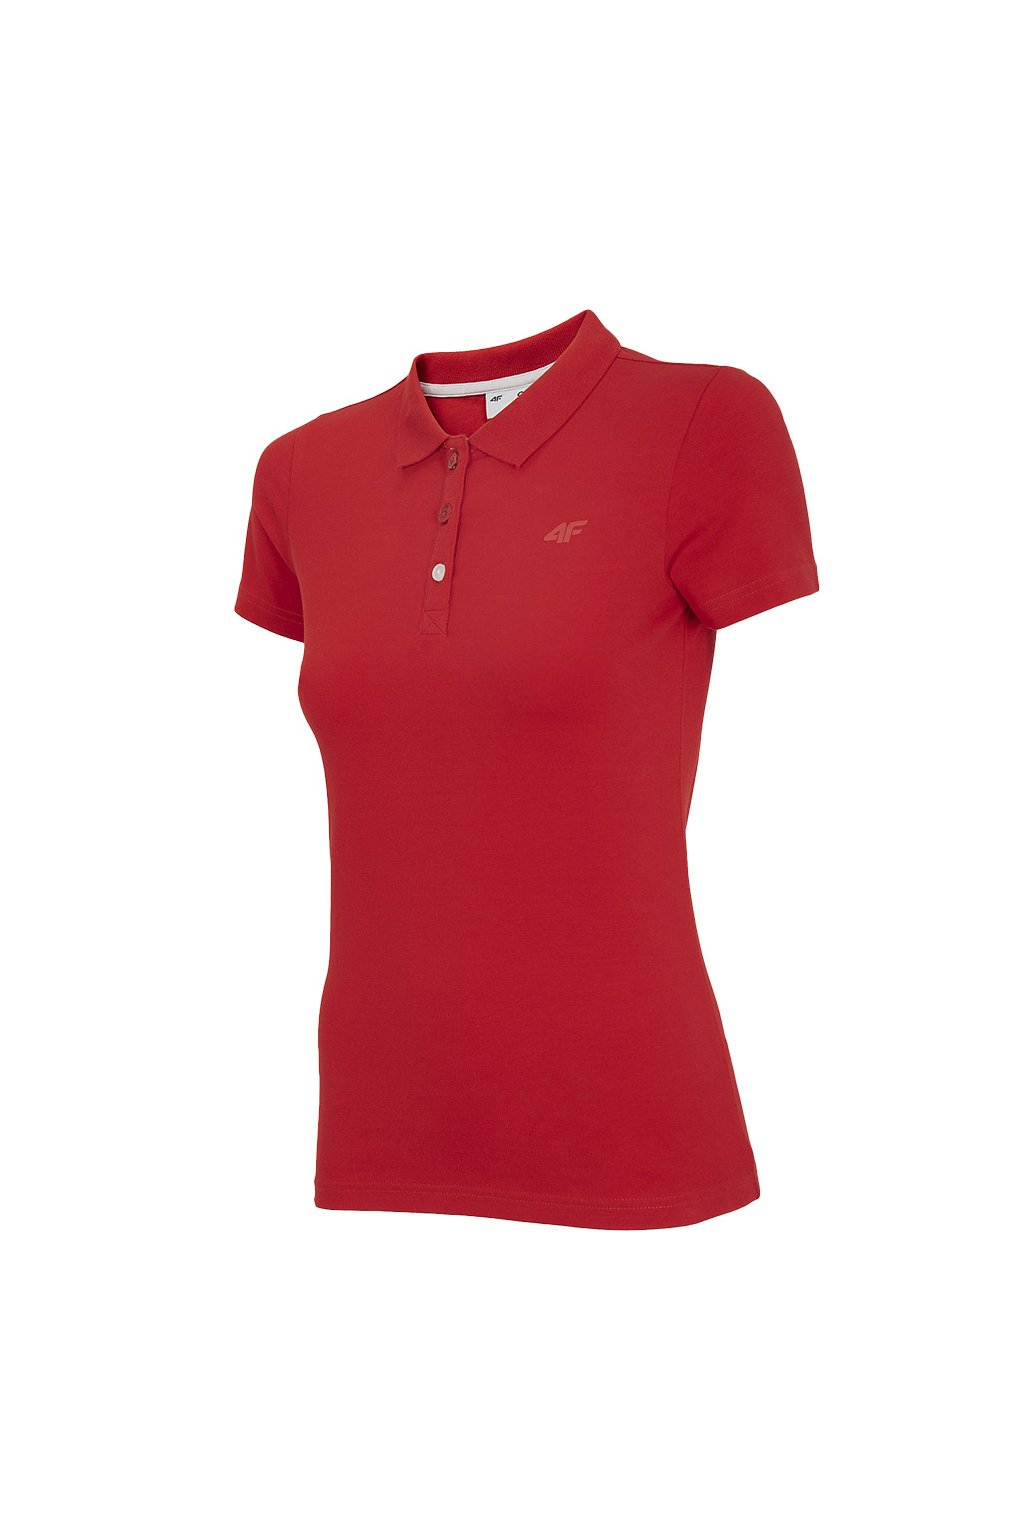 Dámske tričko 4F červené NOSH4 TSD008 62S